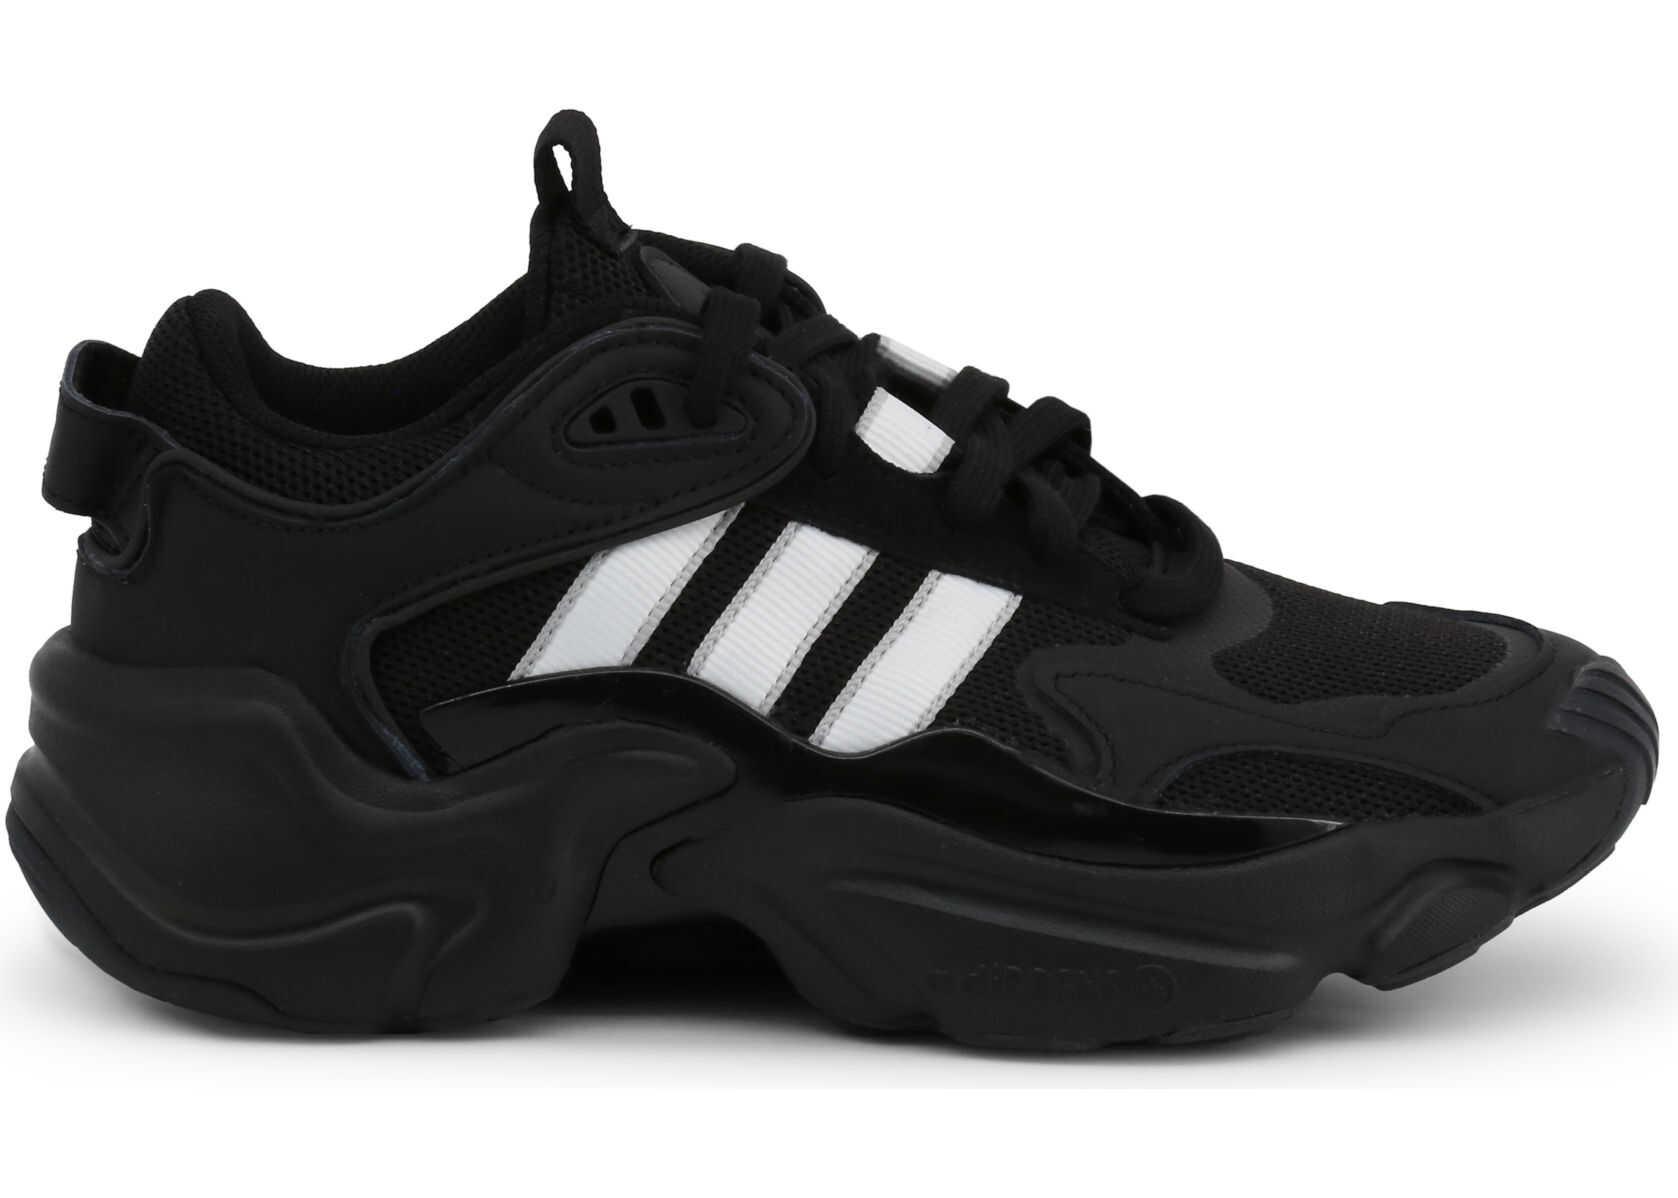 adidas Magmurrunner BLACK